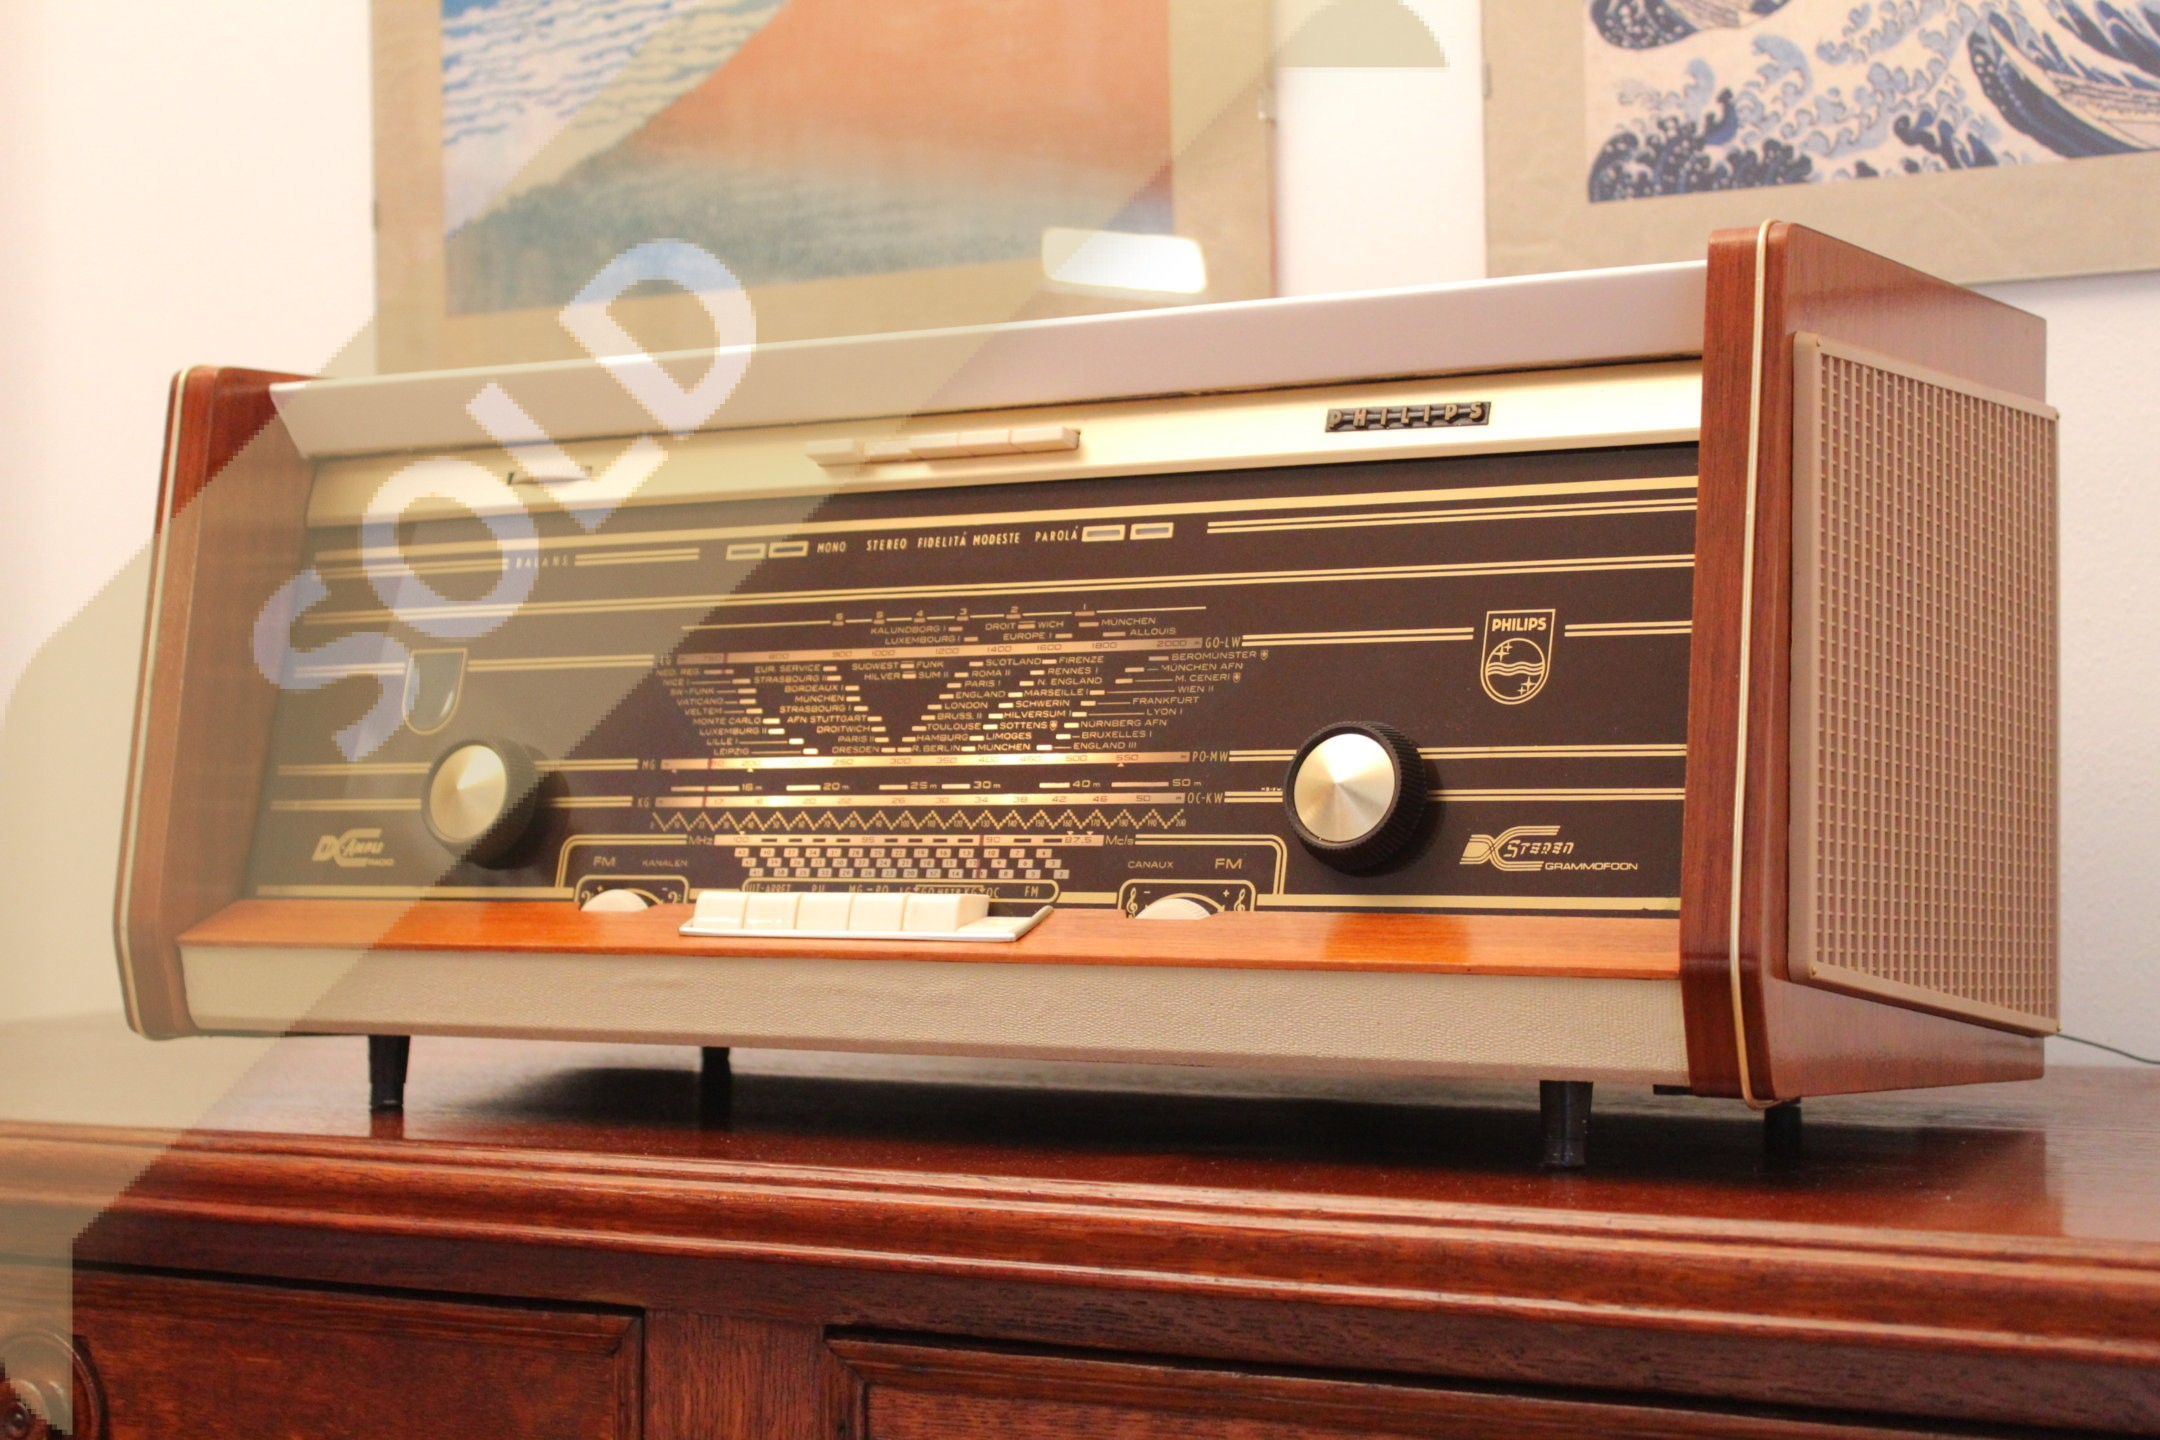 Philips B6X94A 01